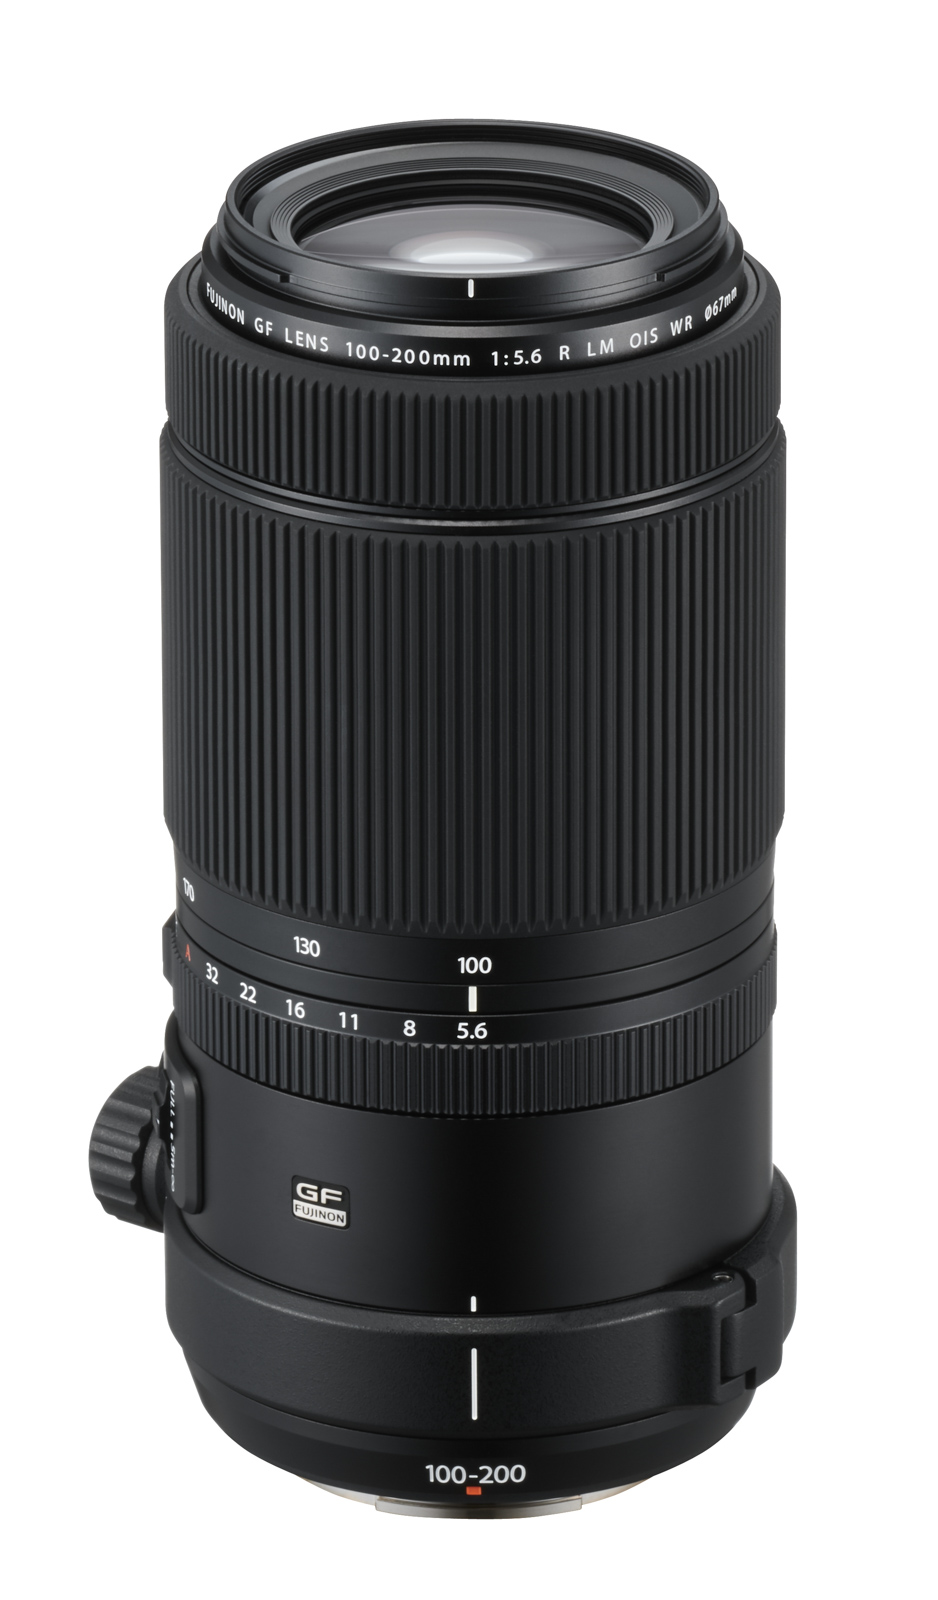 Fujifilm Fujinon GF 100-200mm f/5.6 R L M OIS WR